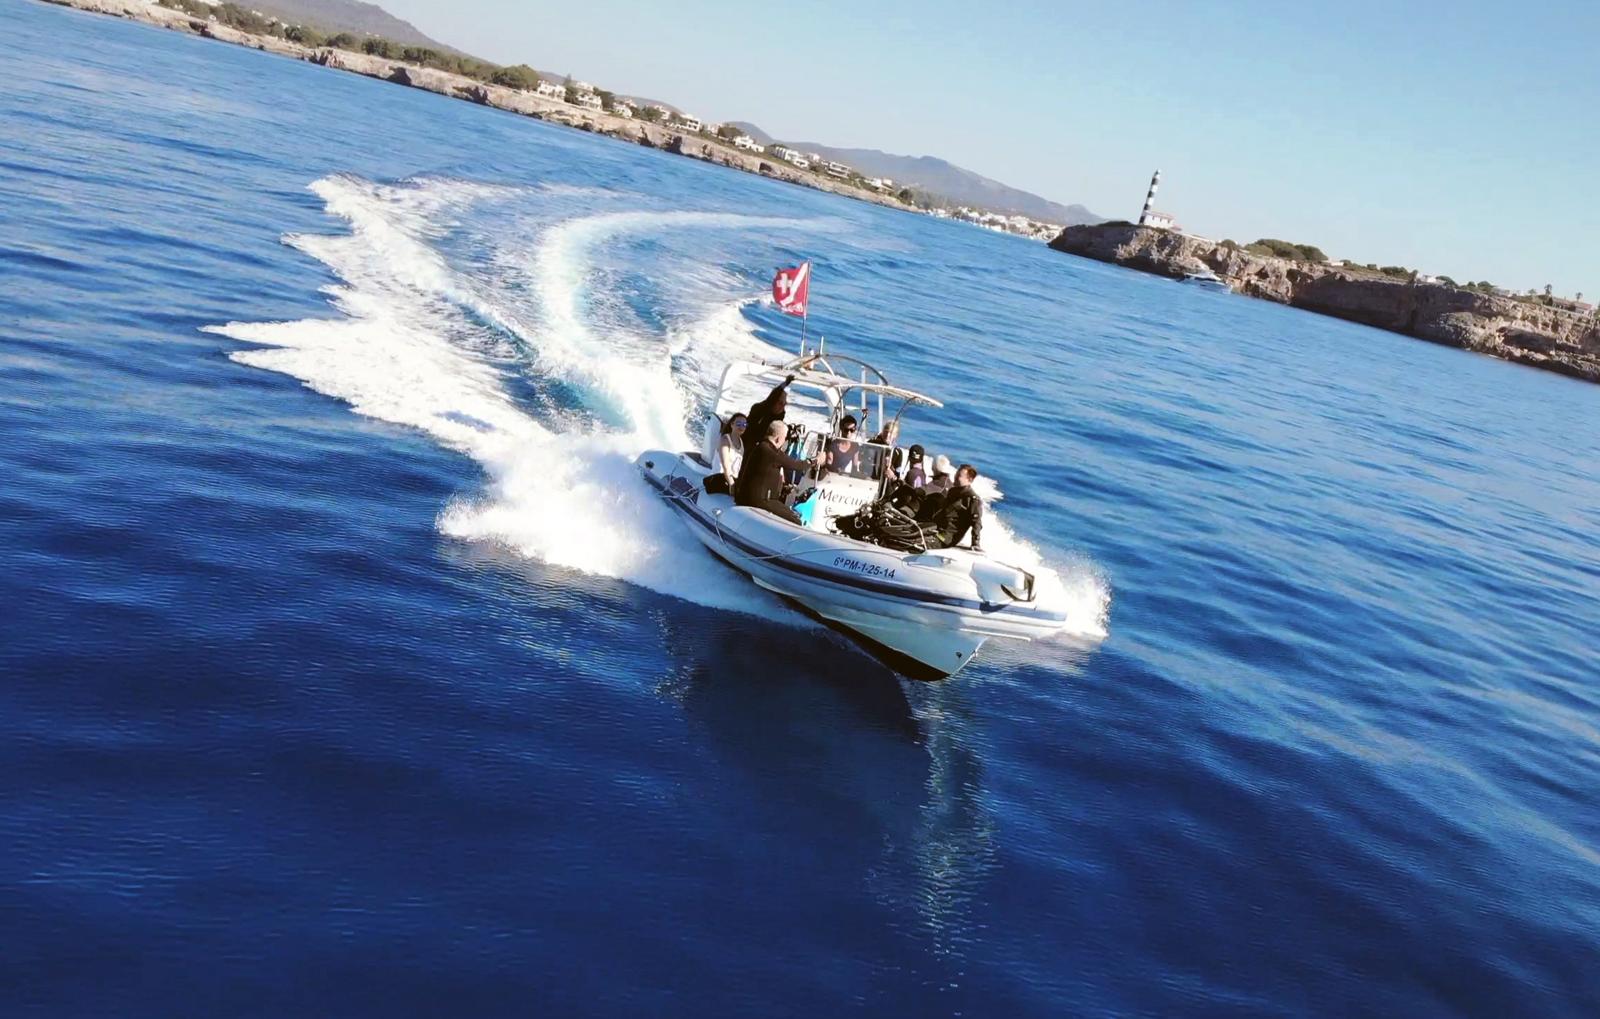 schnorchelkurs-porto-colom-mallorca-bg4